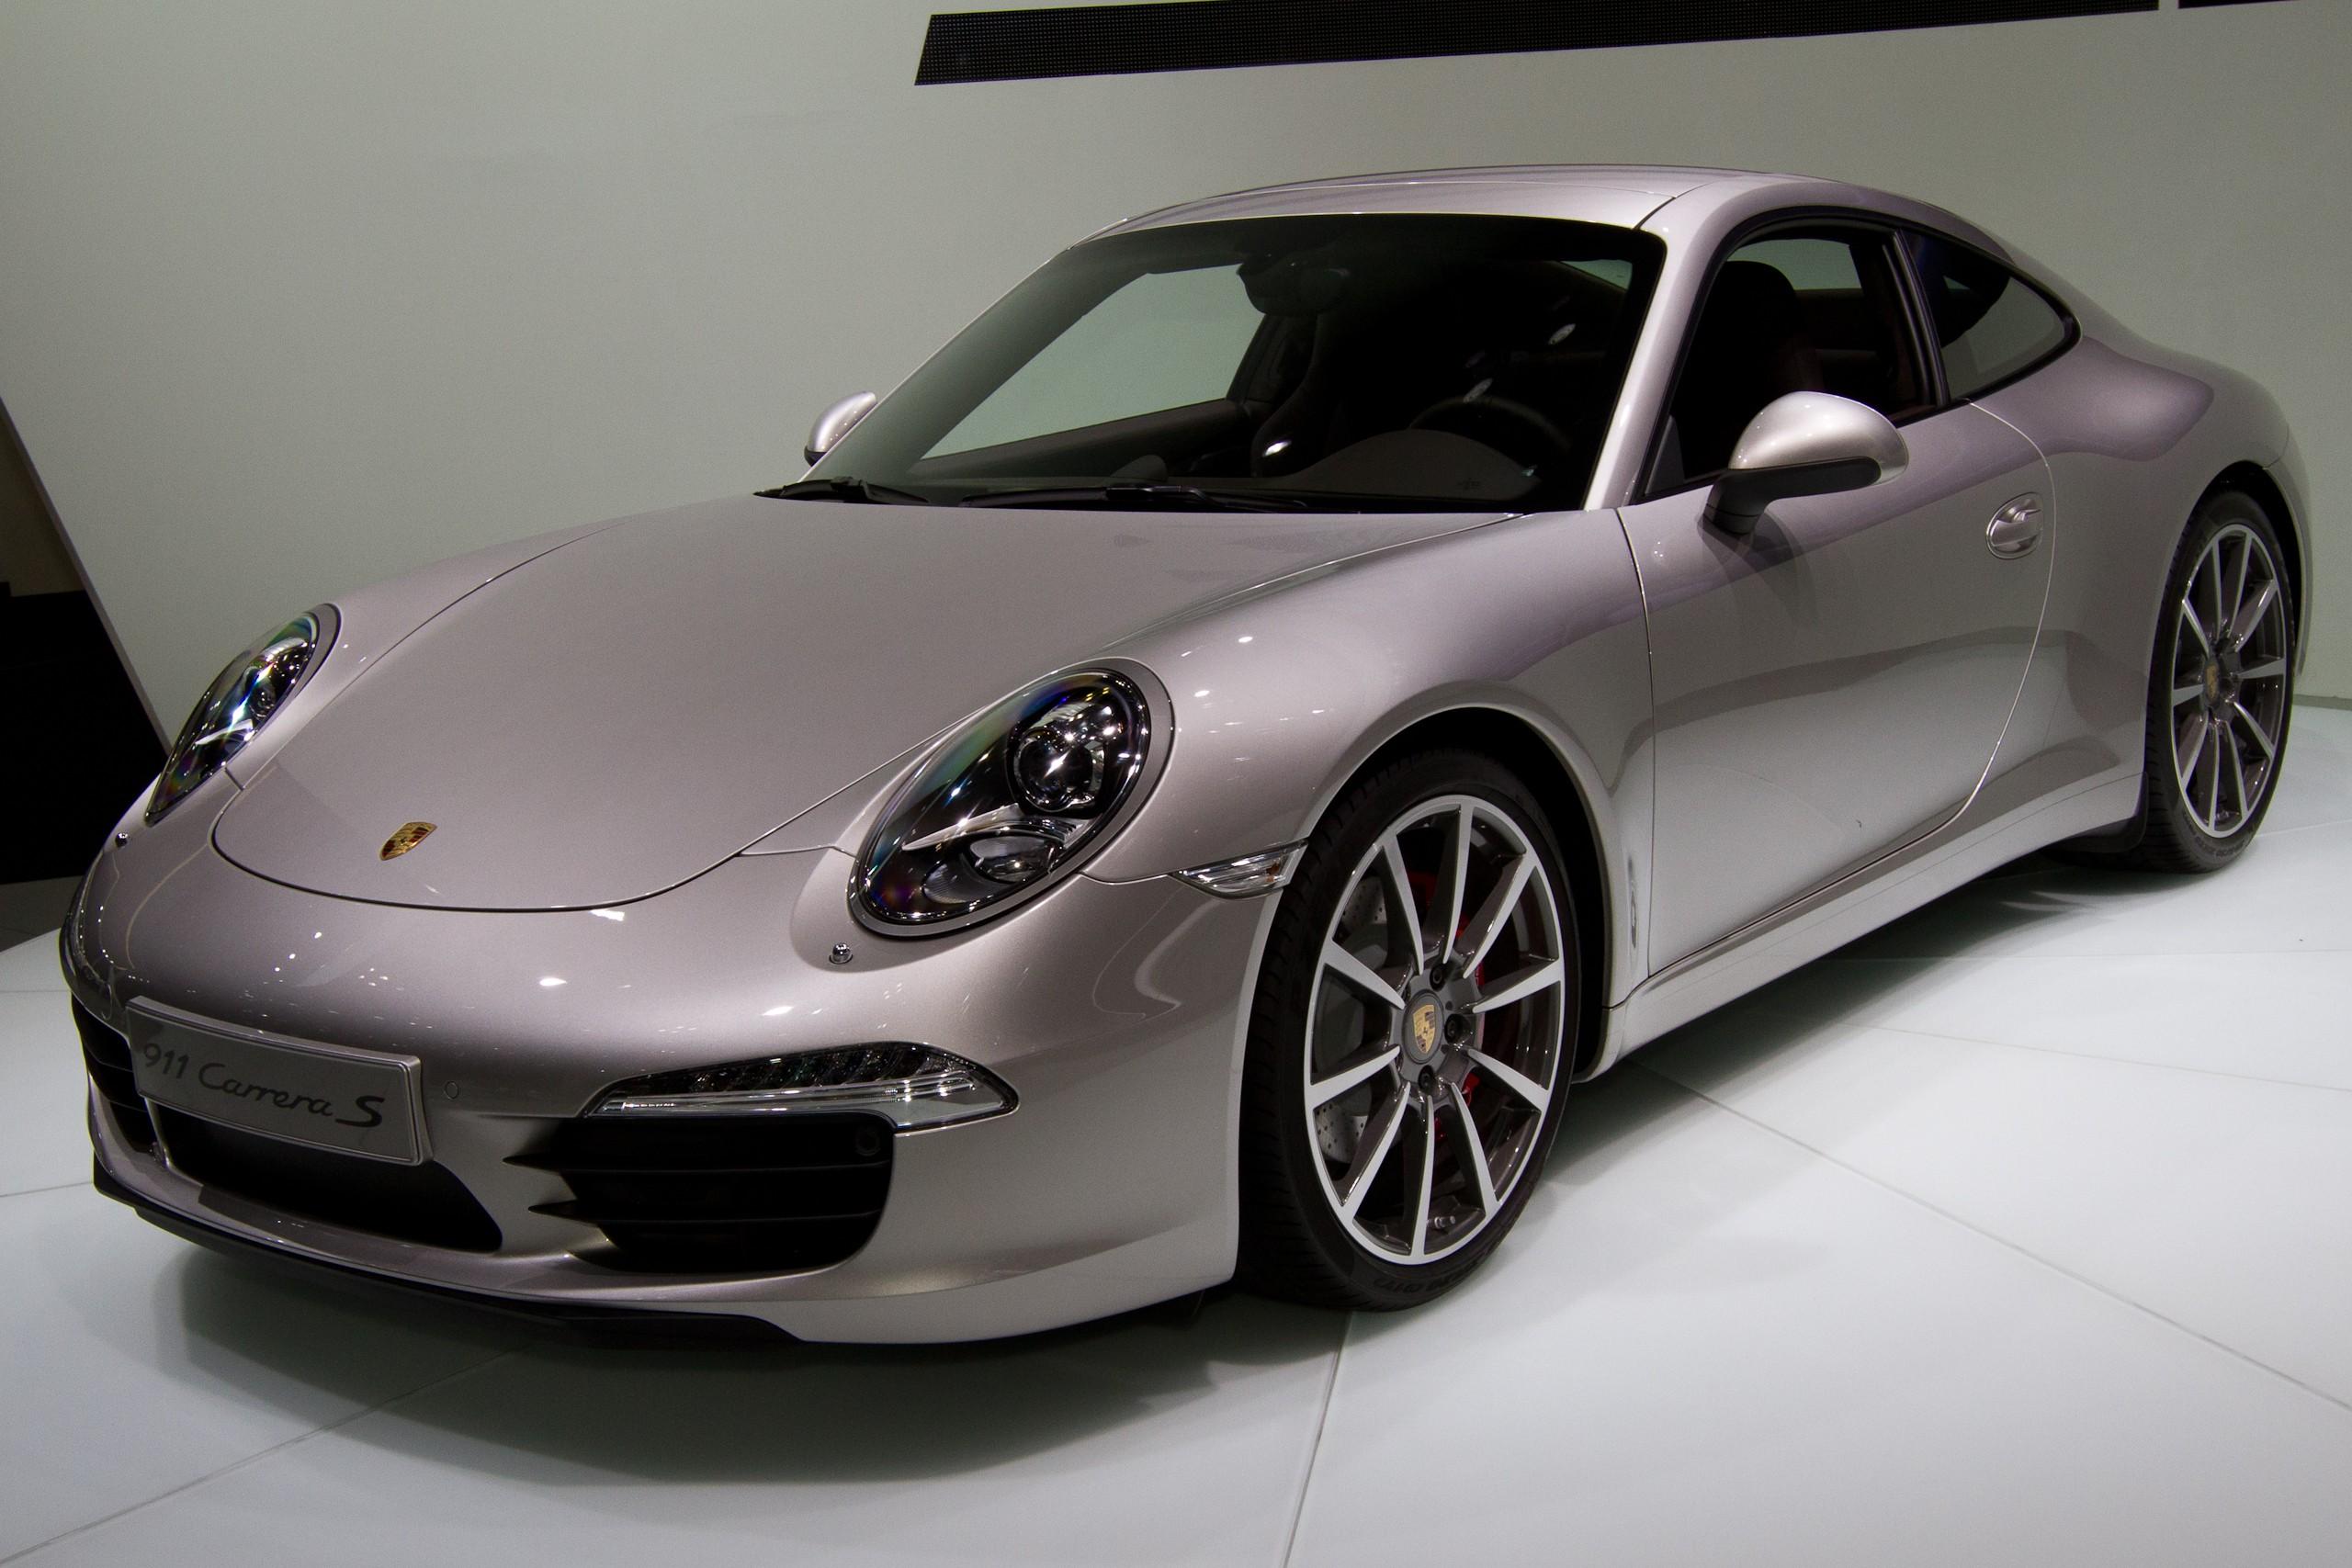 Porsche  Turbo Car Painting